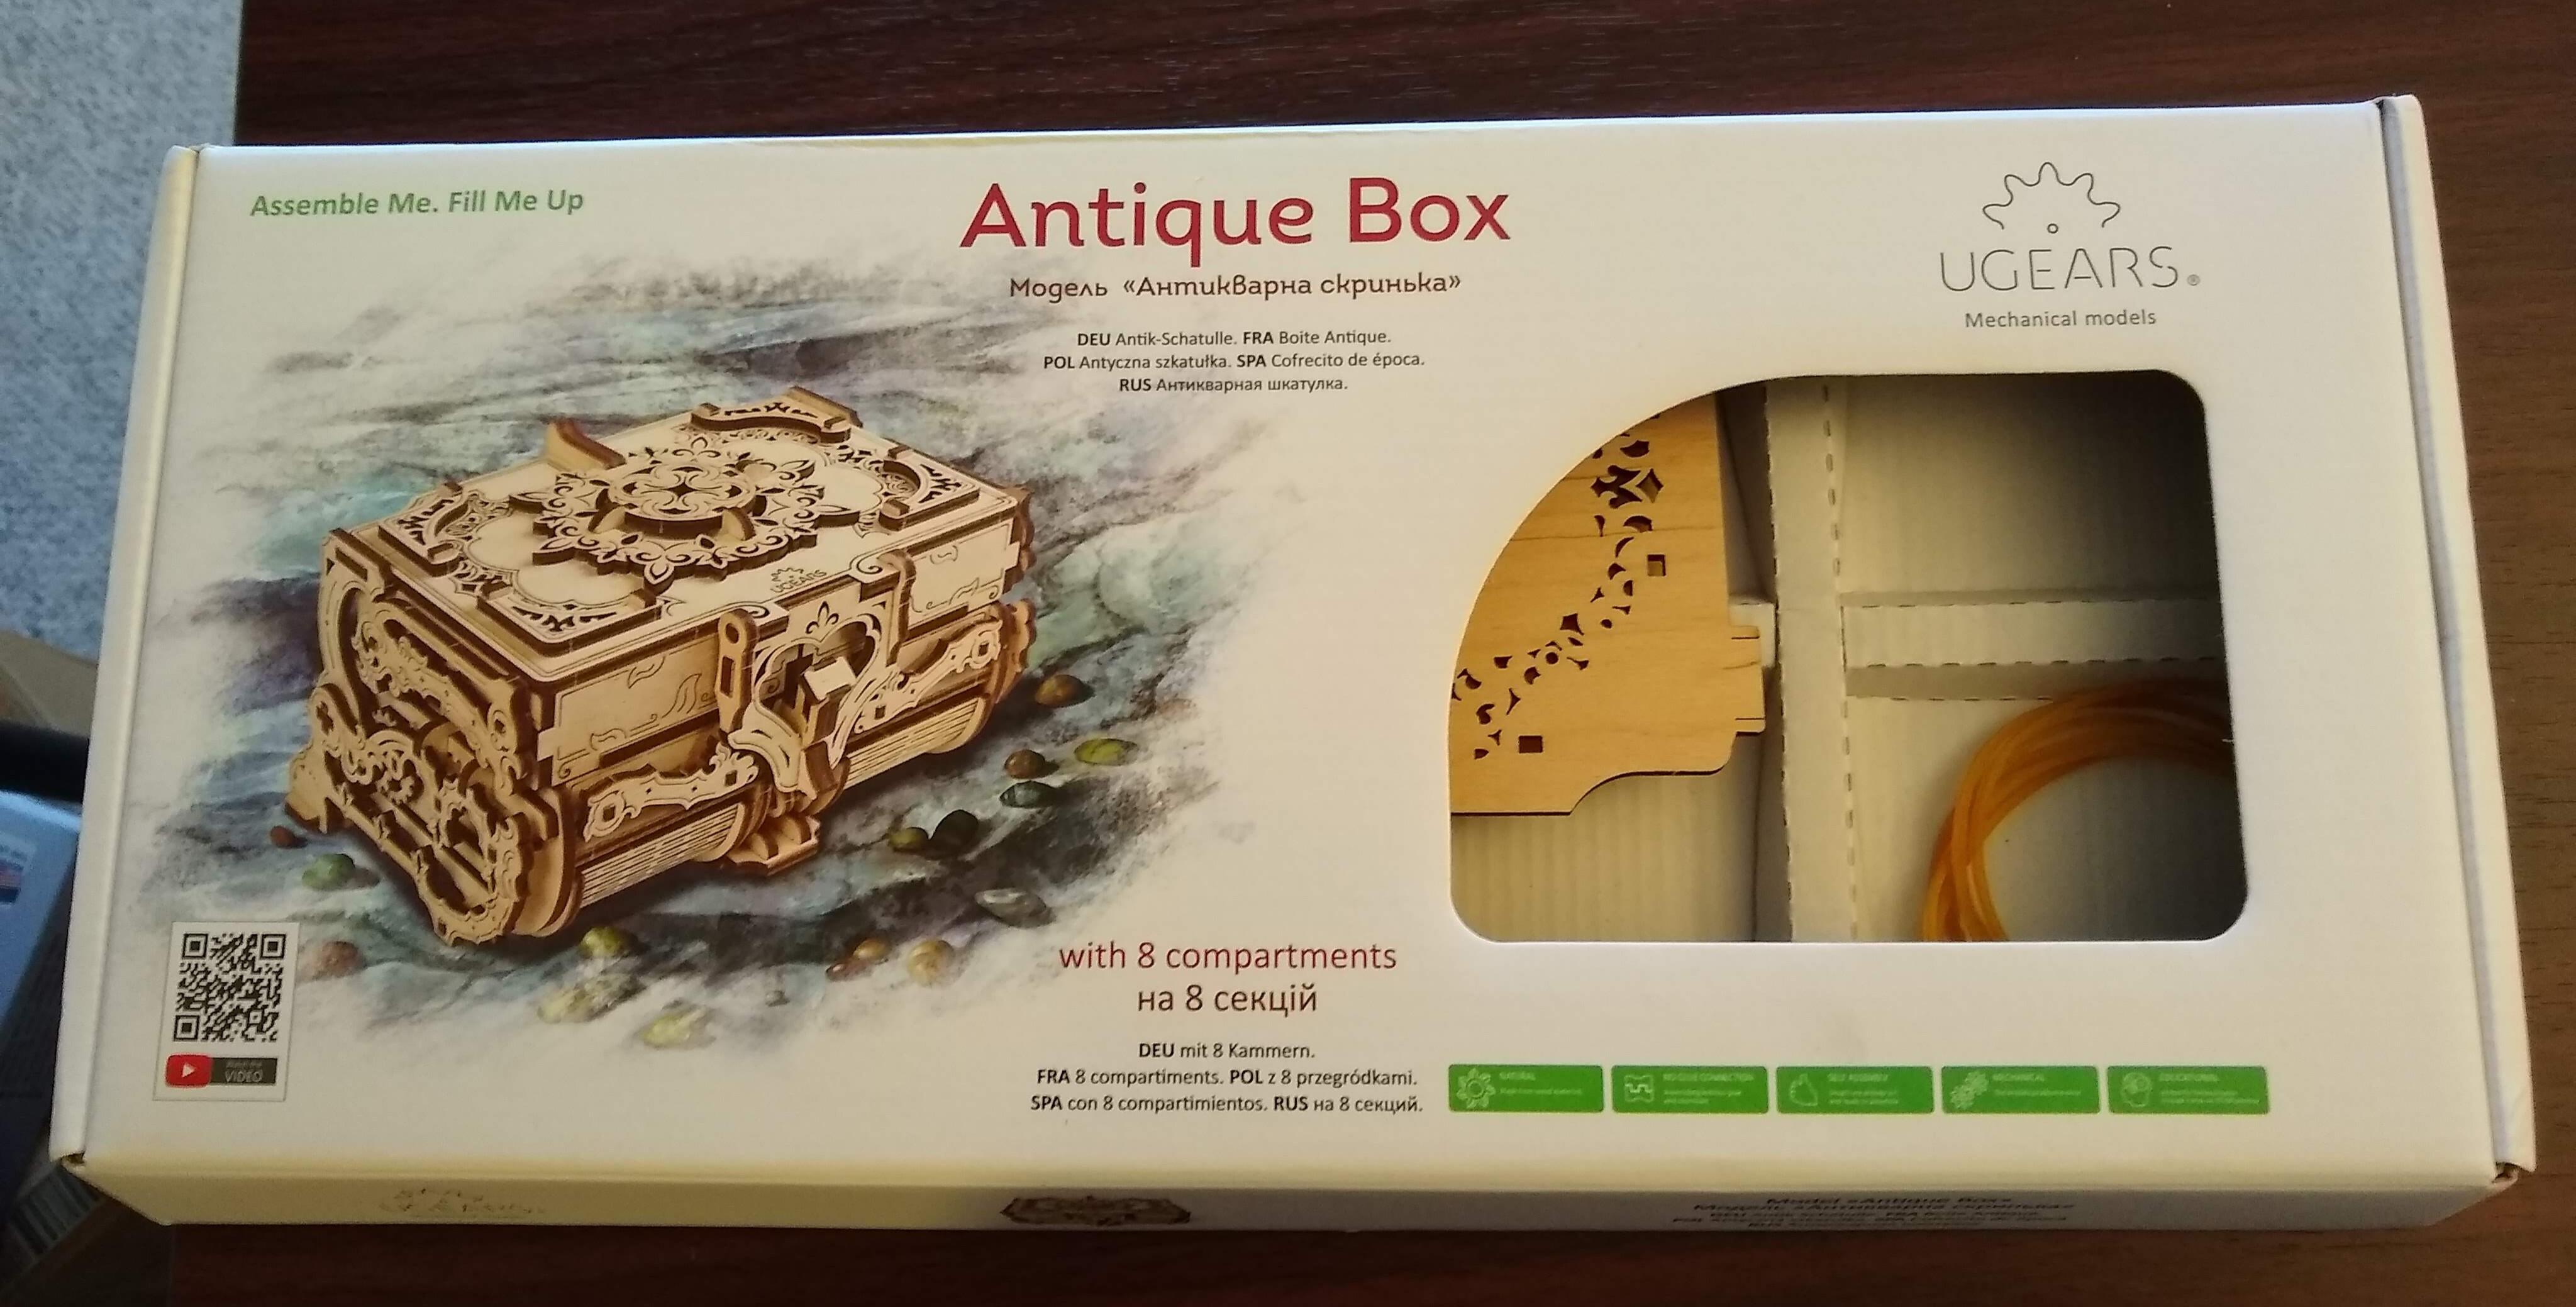 UGEARS Antique Box.jpg